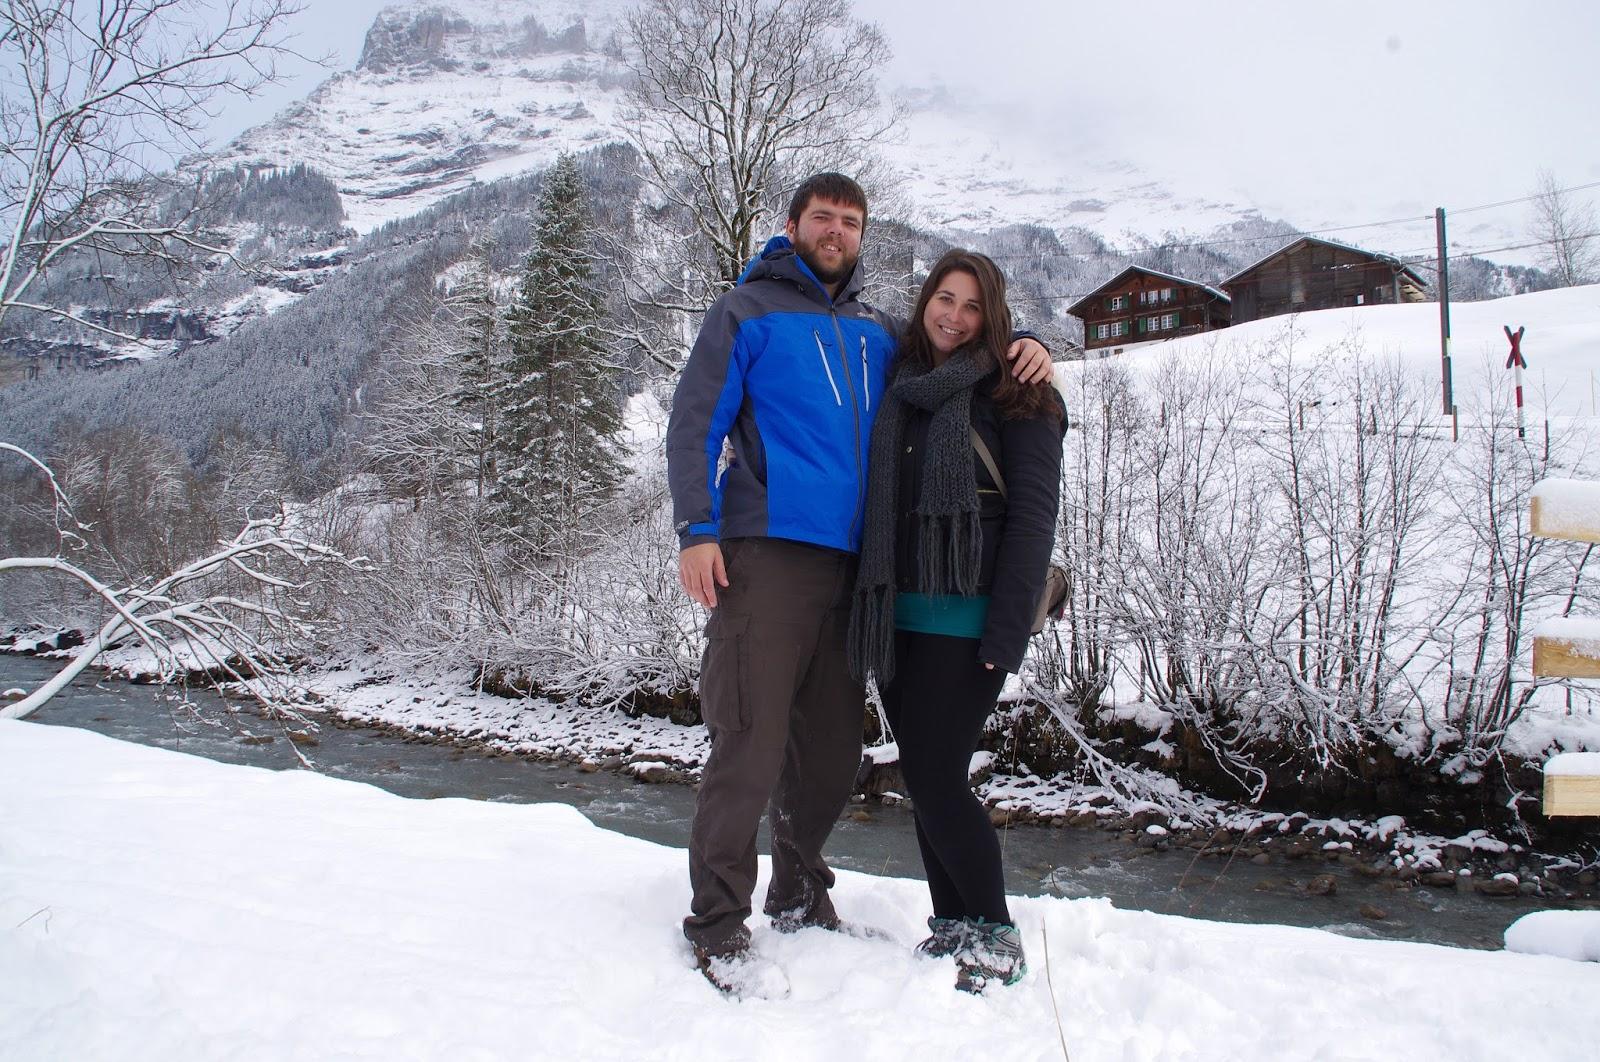 Grindelwald Winter